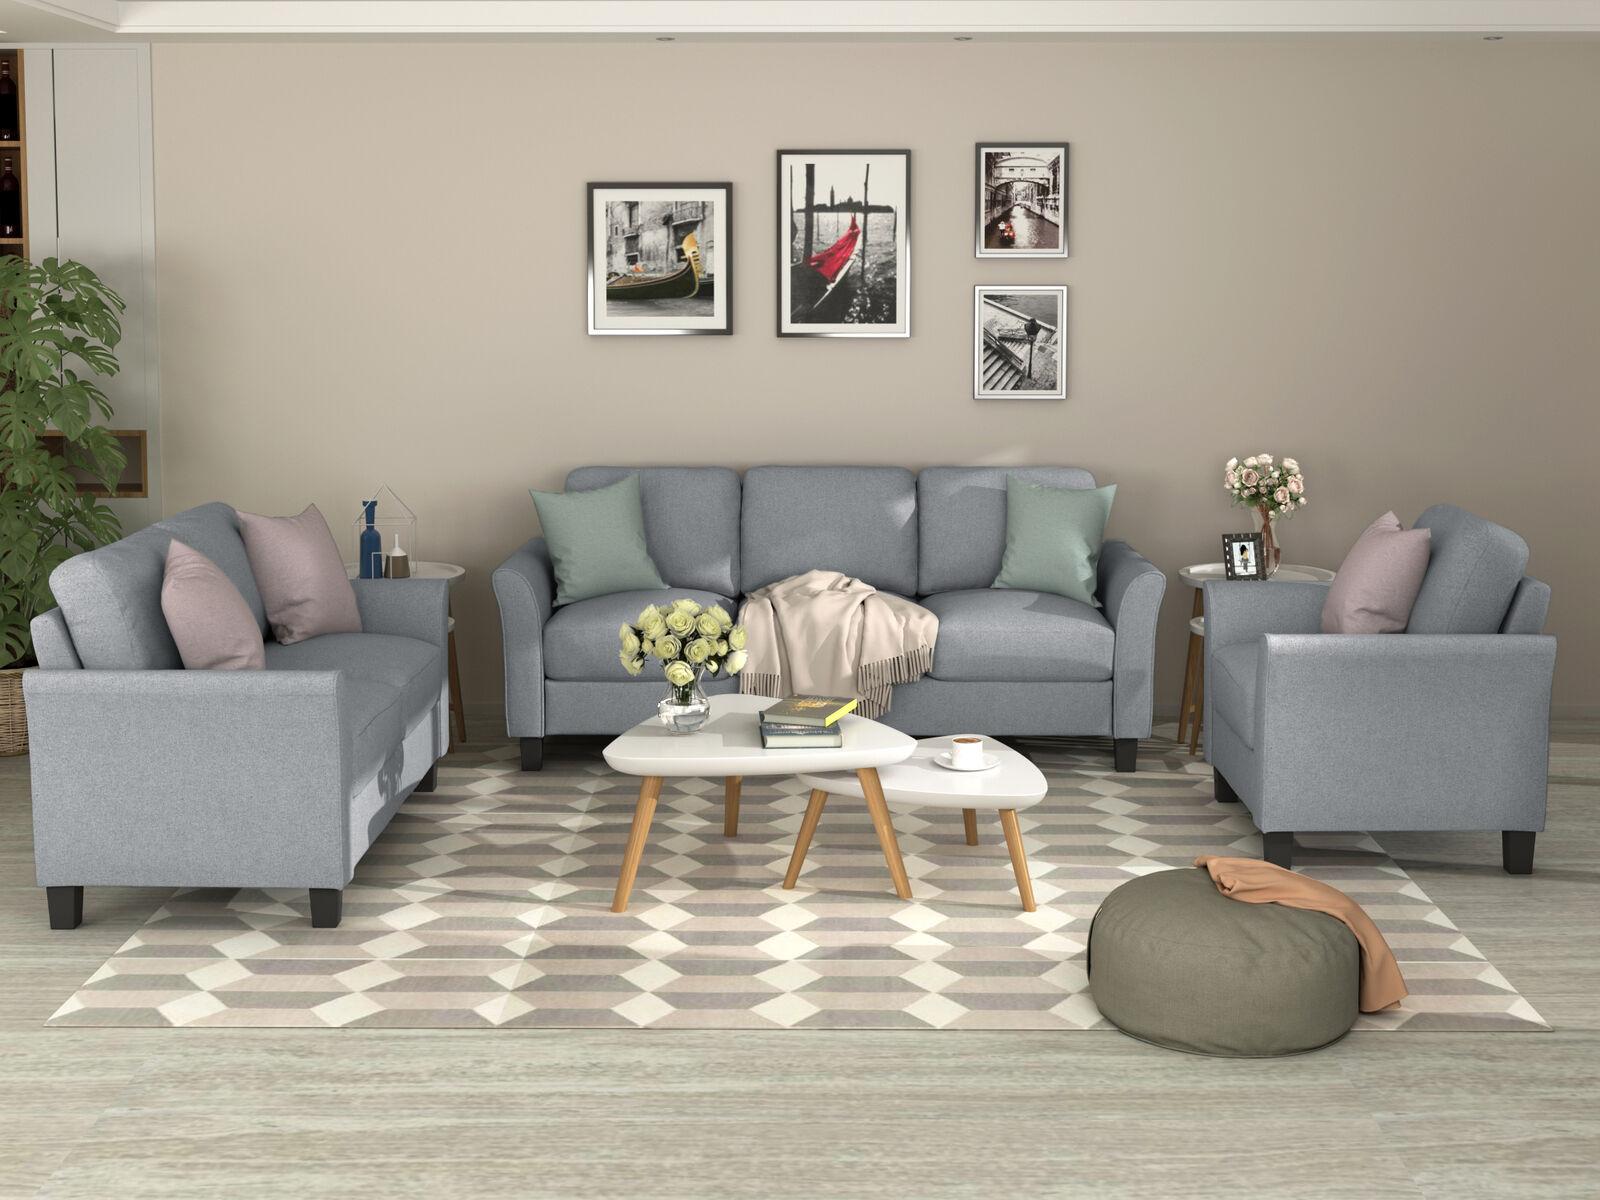 Sofa Set 3 2 1 Fabric Couch Design